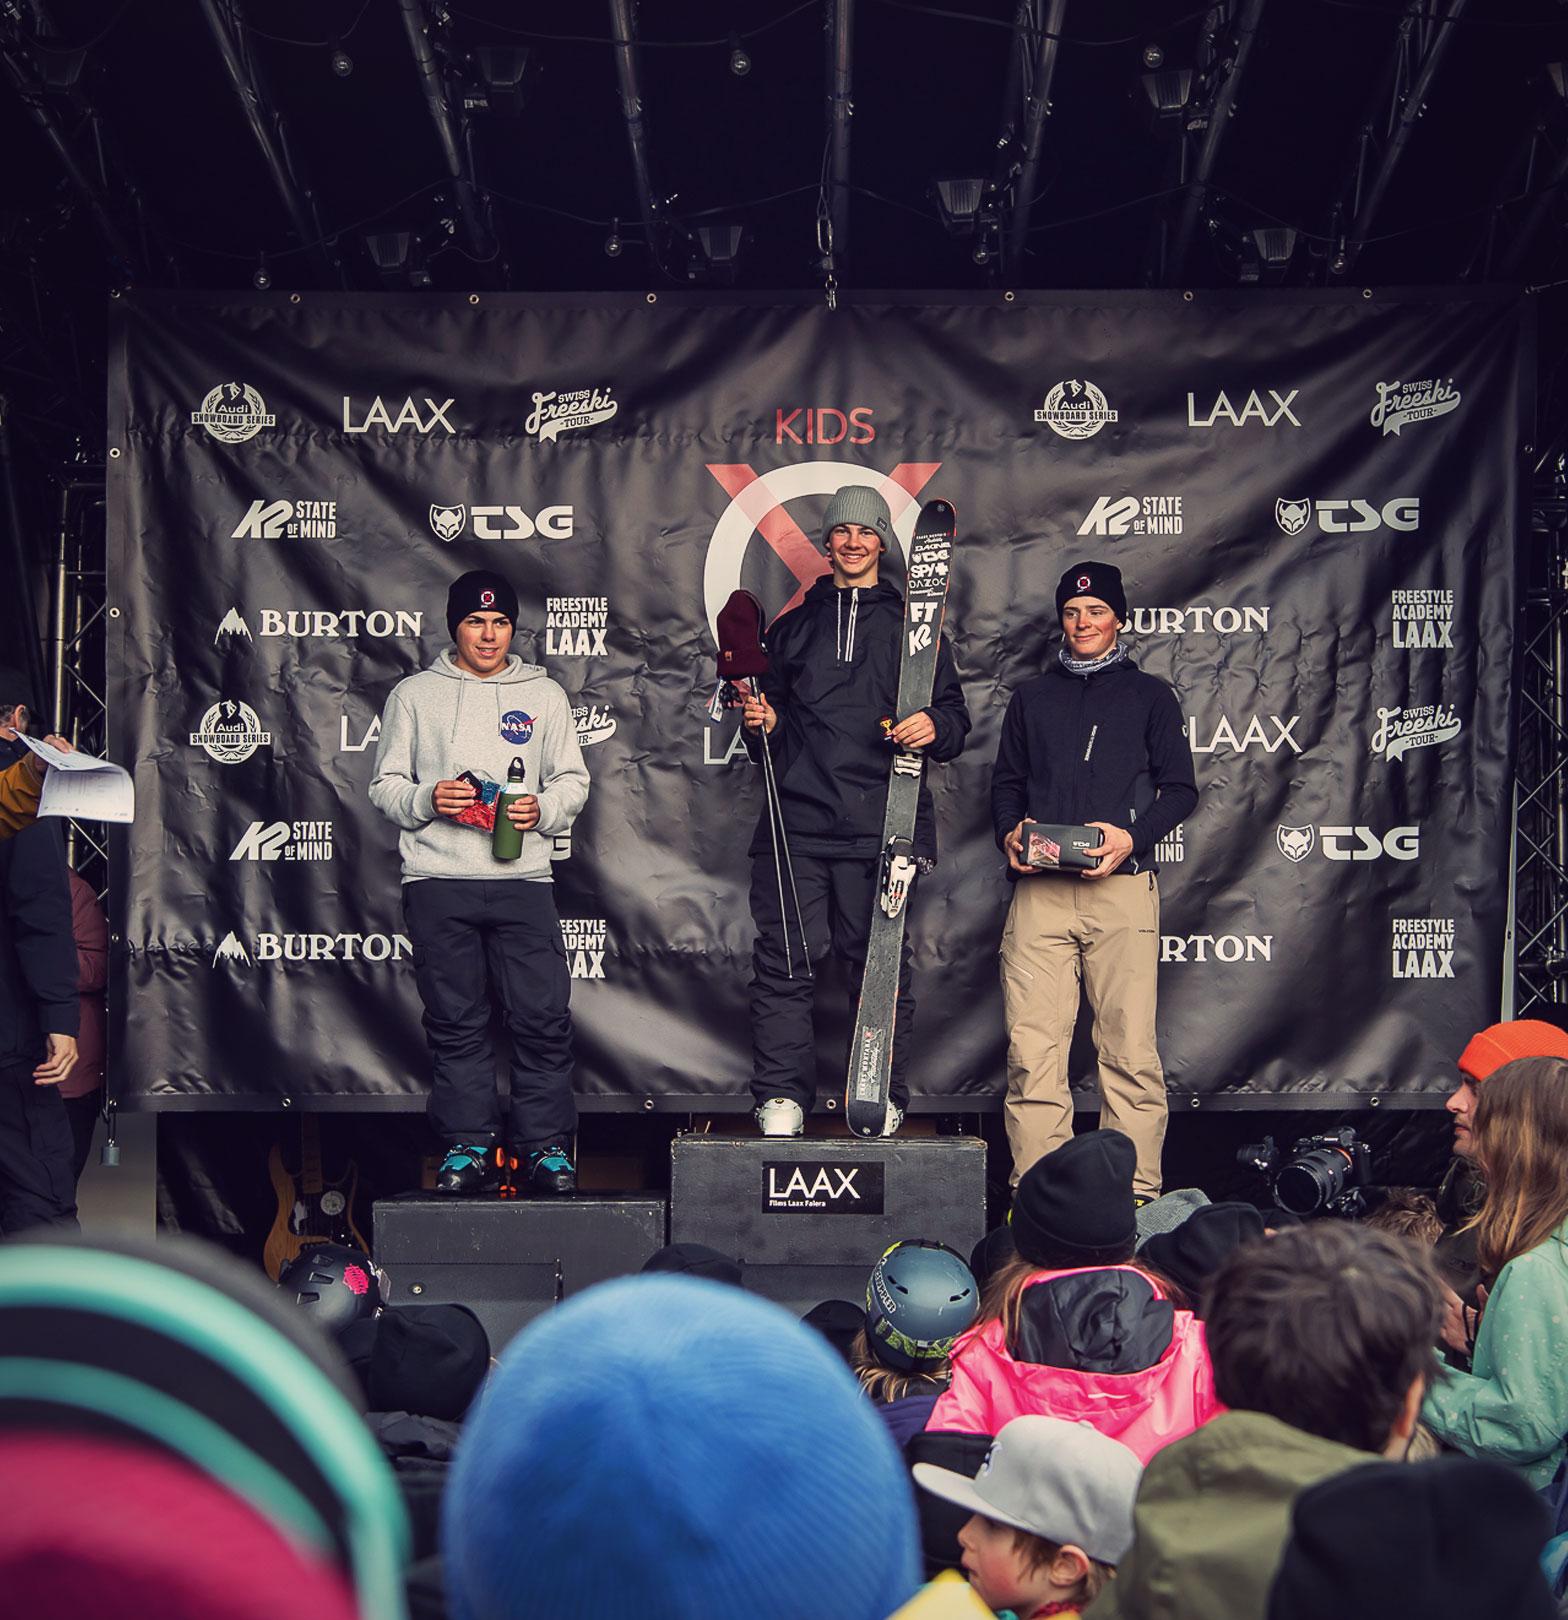 TSG Kids Kids Laax Open 2019 snowpark laax podium Aurelien Coubes